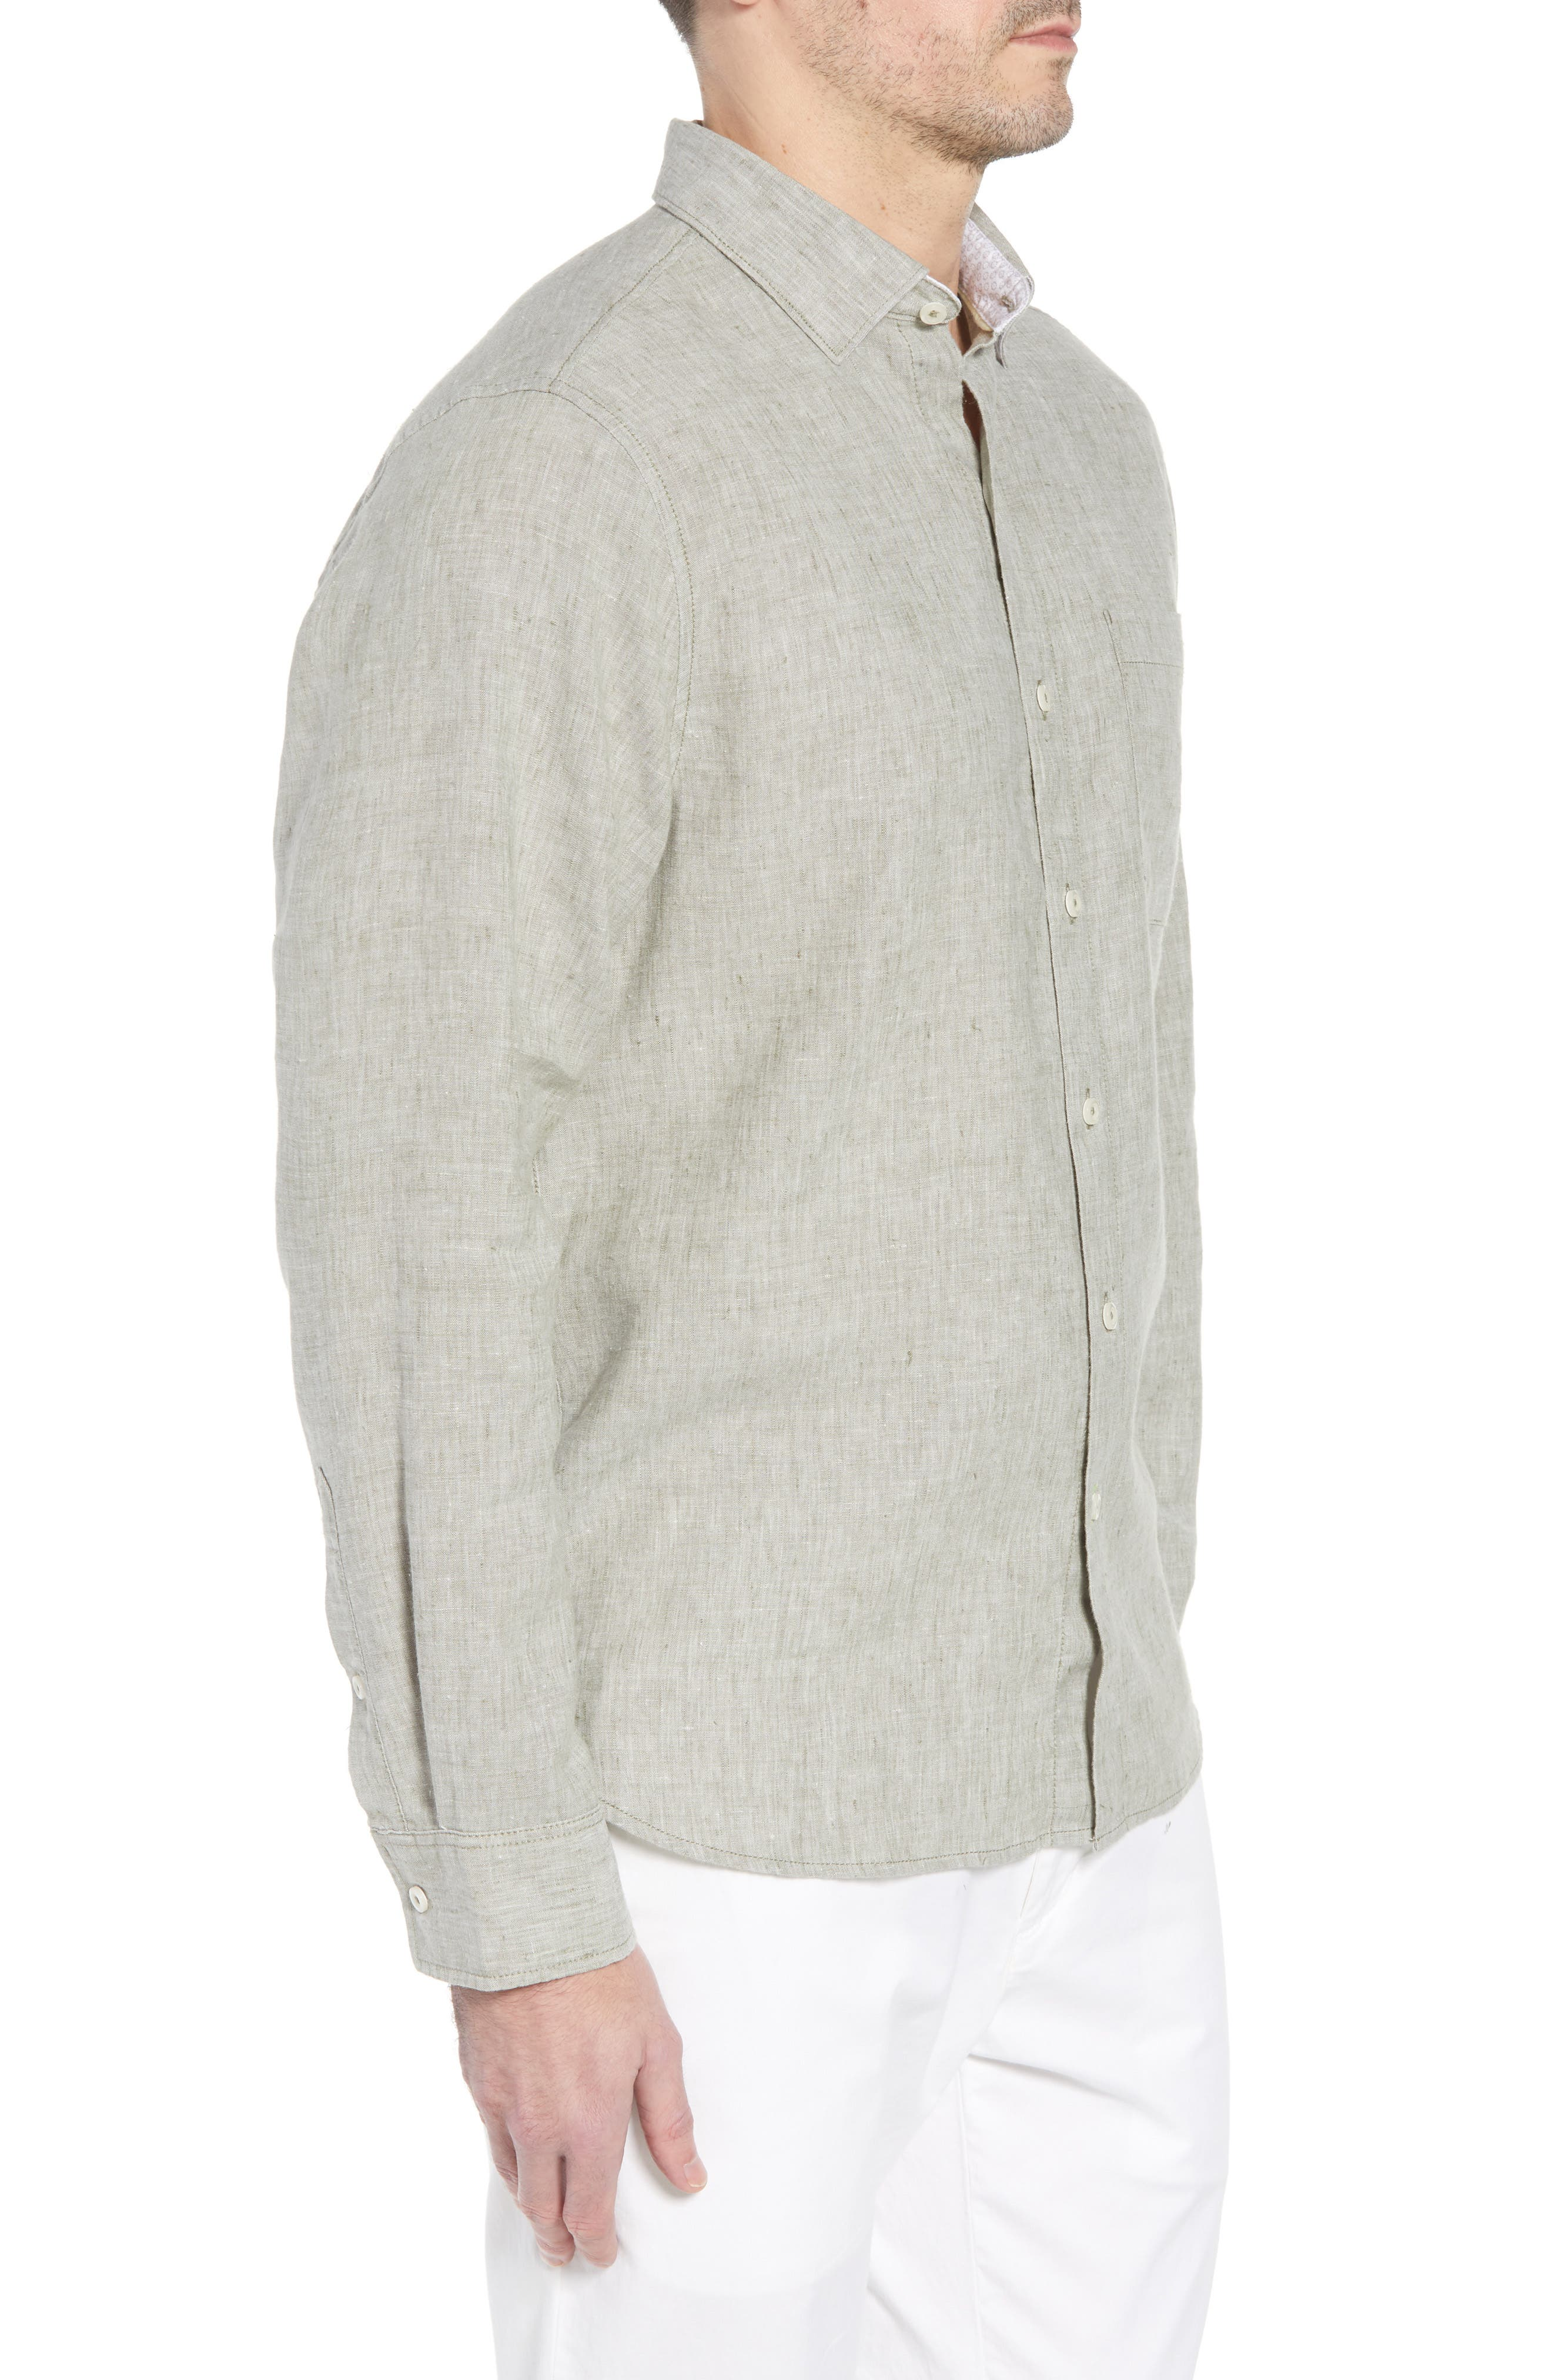 Alternate Image 3  - Tommy Bahama Lanai Tides Regular Fit Linen Blend Sport Shirt